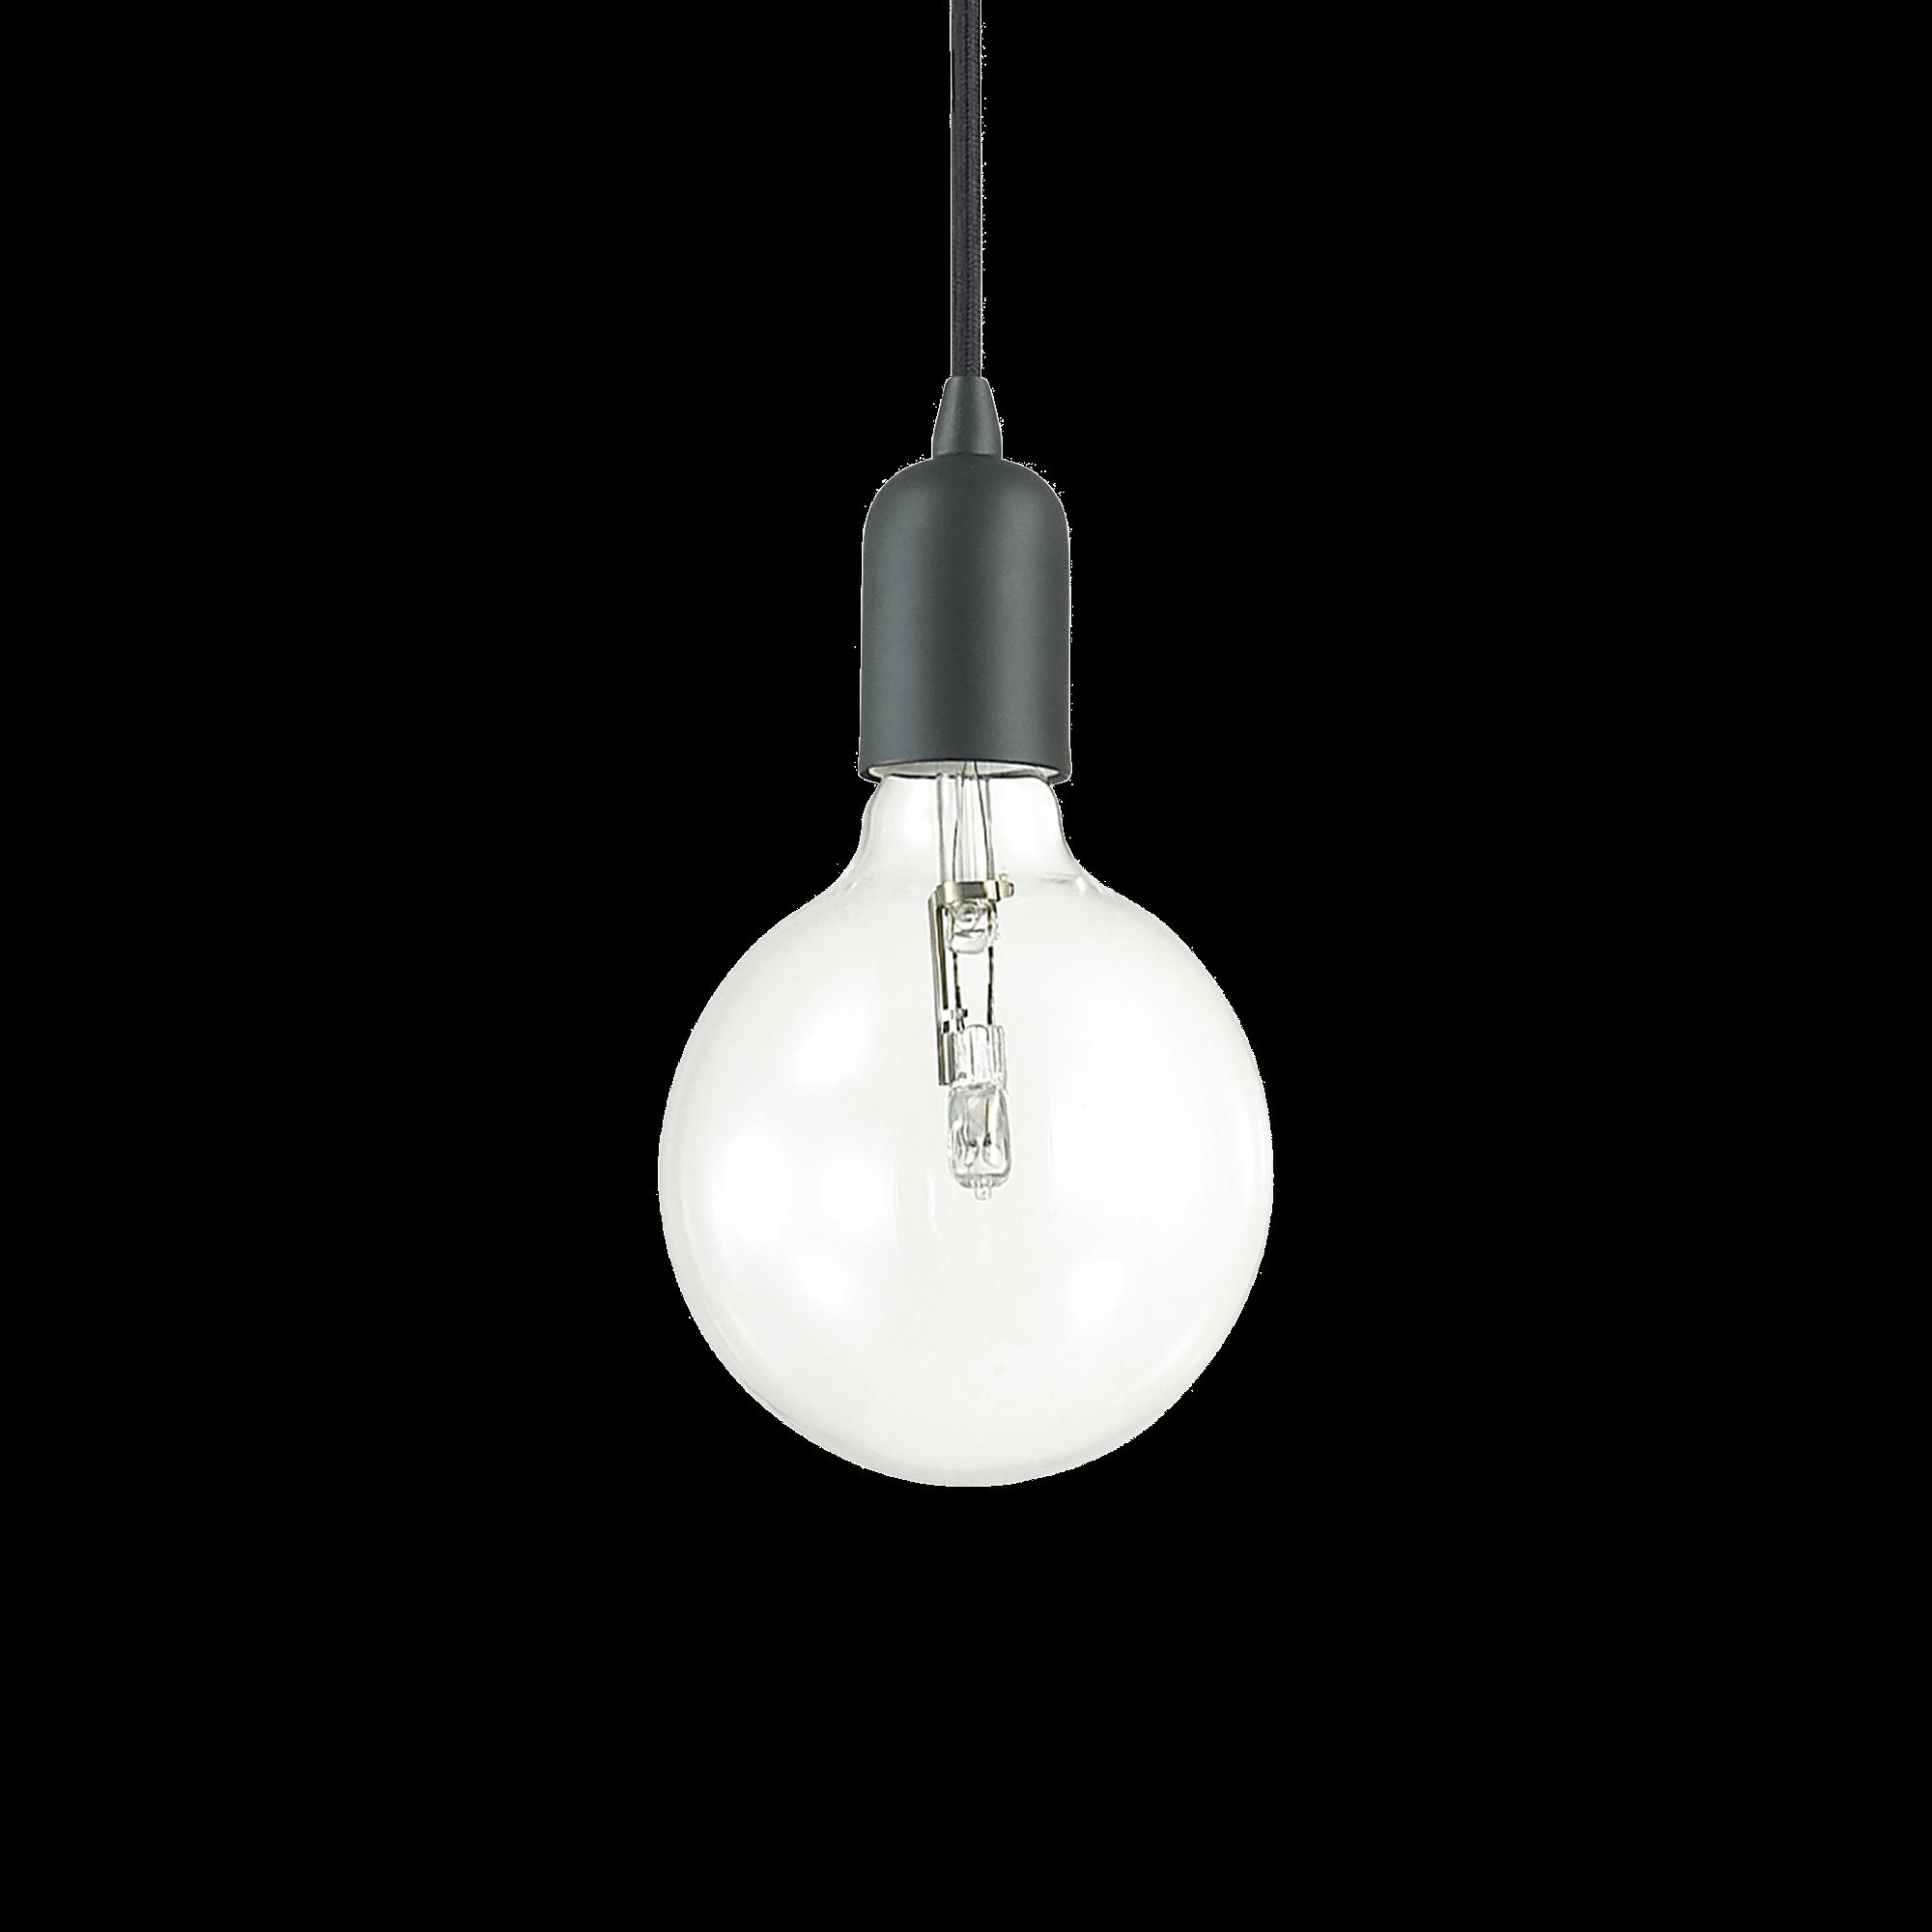 Ideal Lux 175935 IT SP1 NERO függeszték